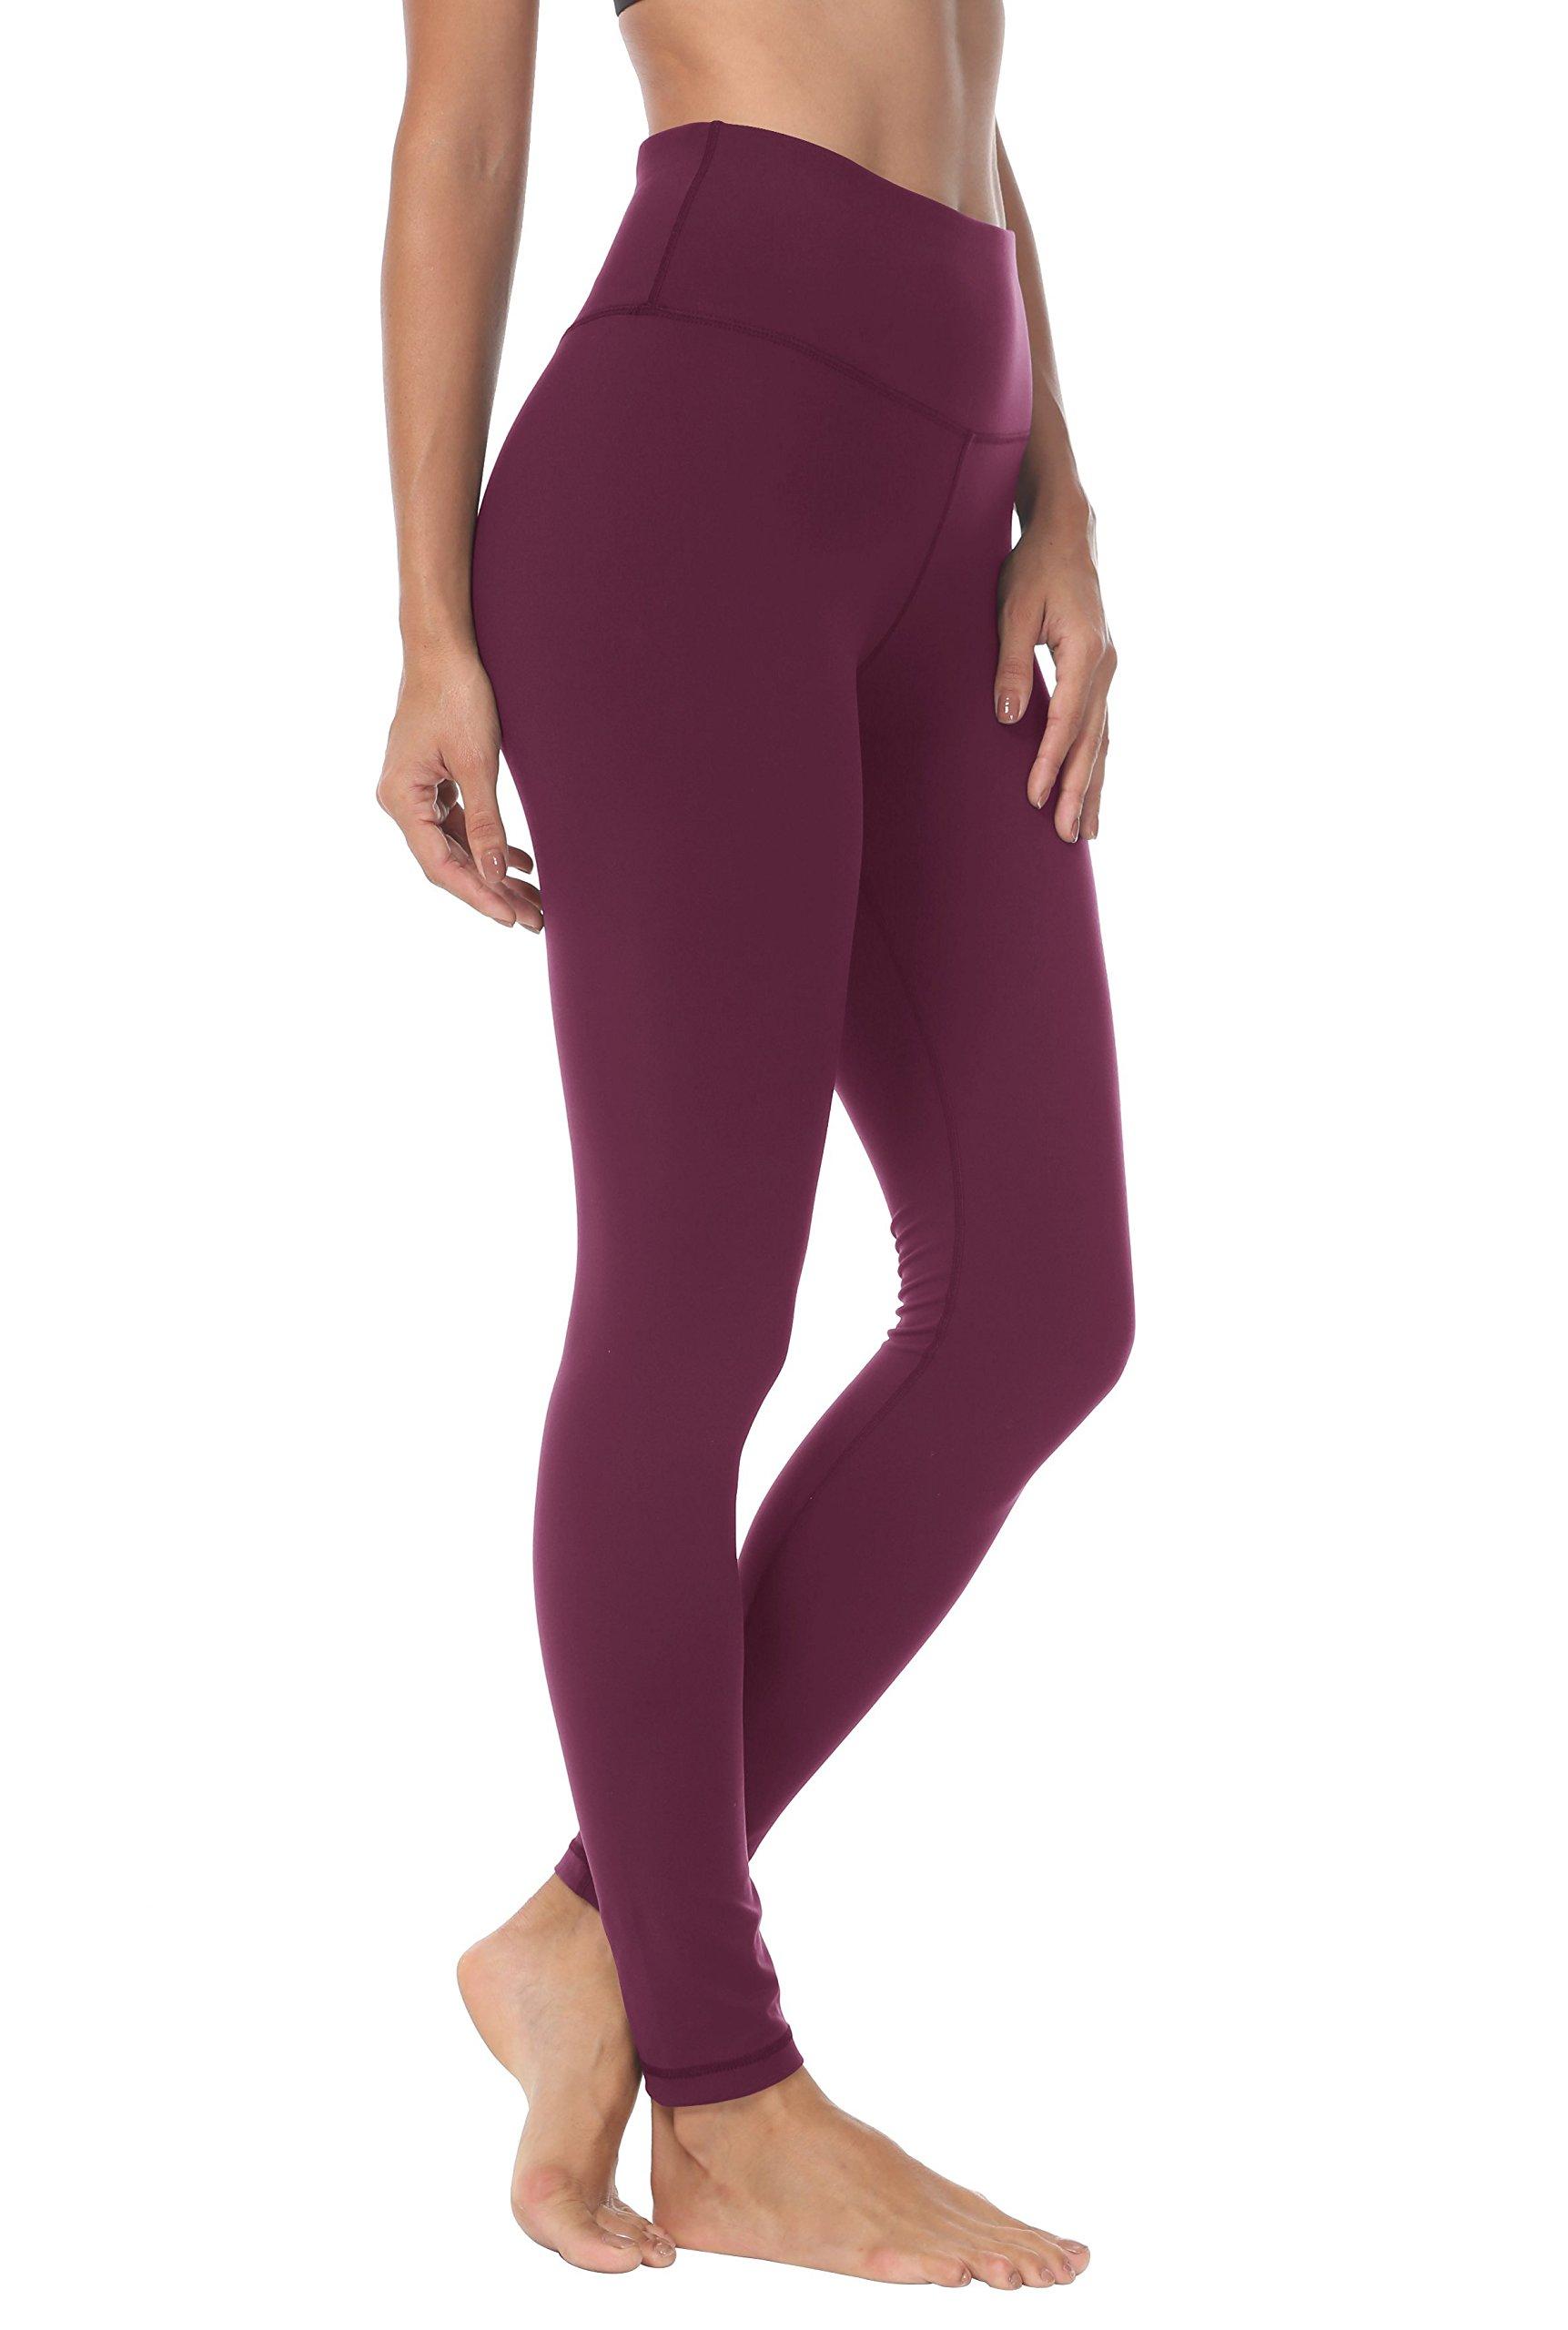 67e54289add1a Queenie Ke Women Yoga Leggings Pants Workout Running Peach Hip | Amazon